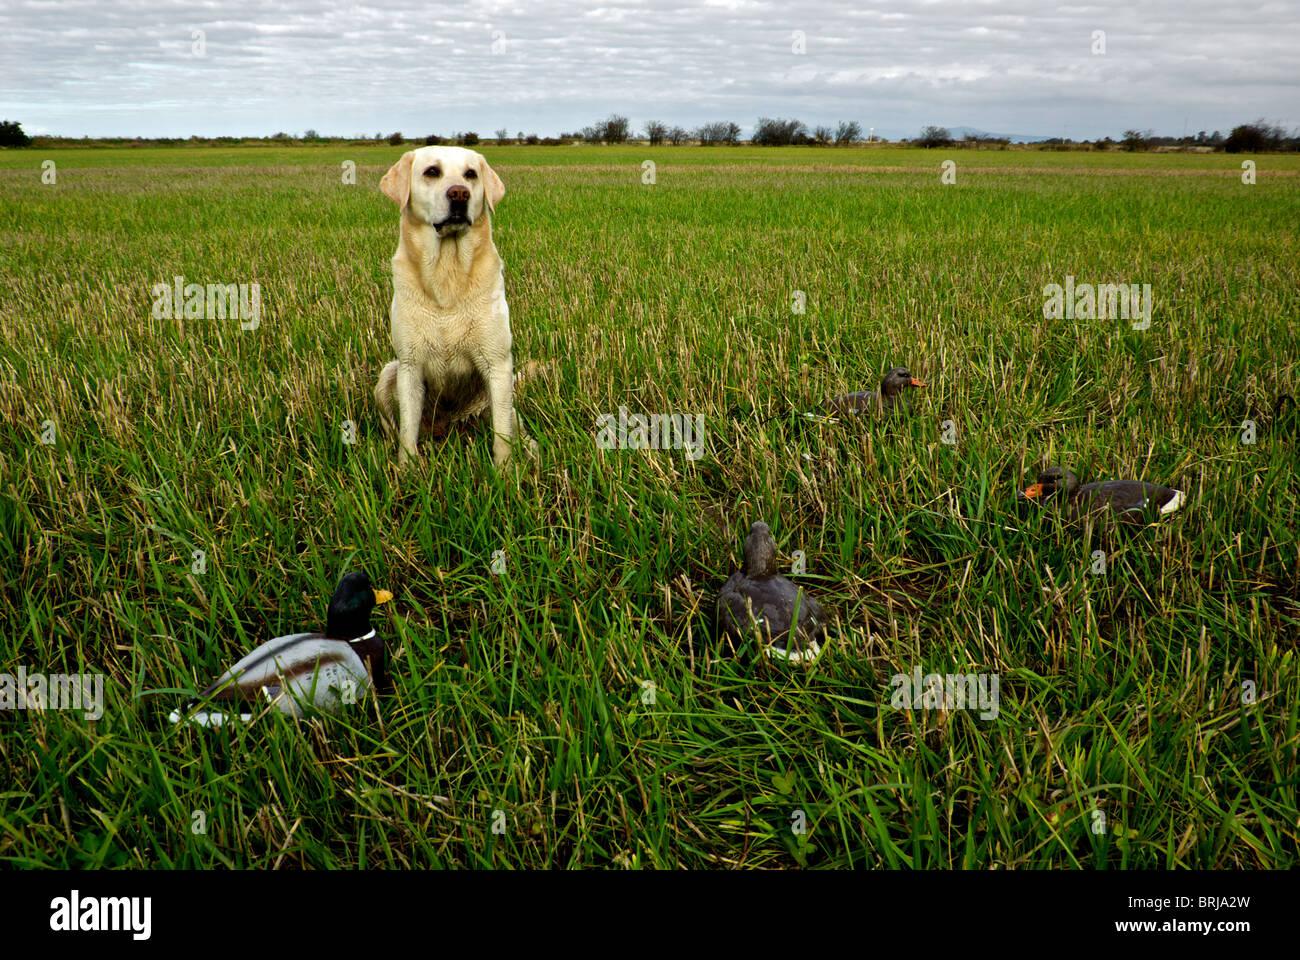 Duck Decoys Stock Photos & Duck Decoys Stock Images - Alamy - photo#30